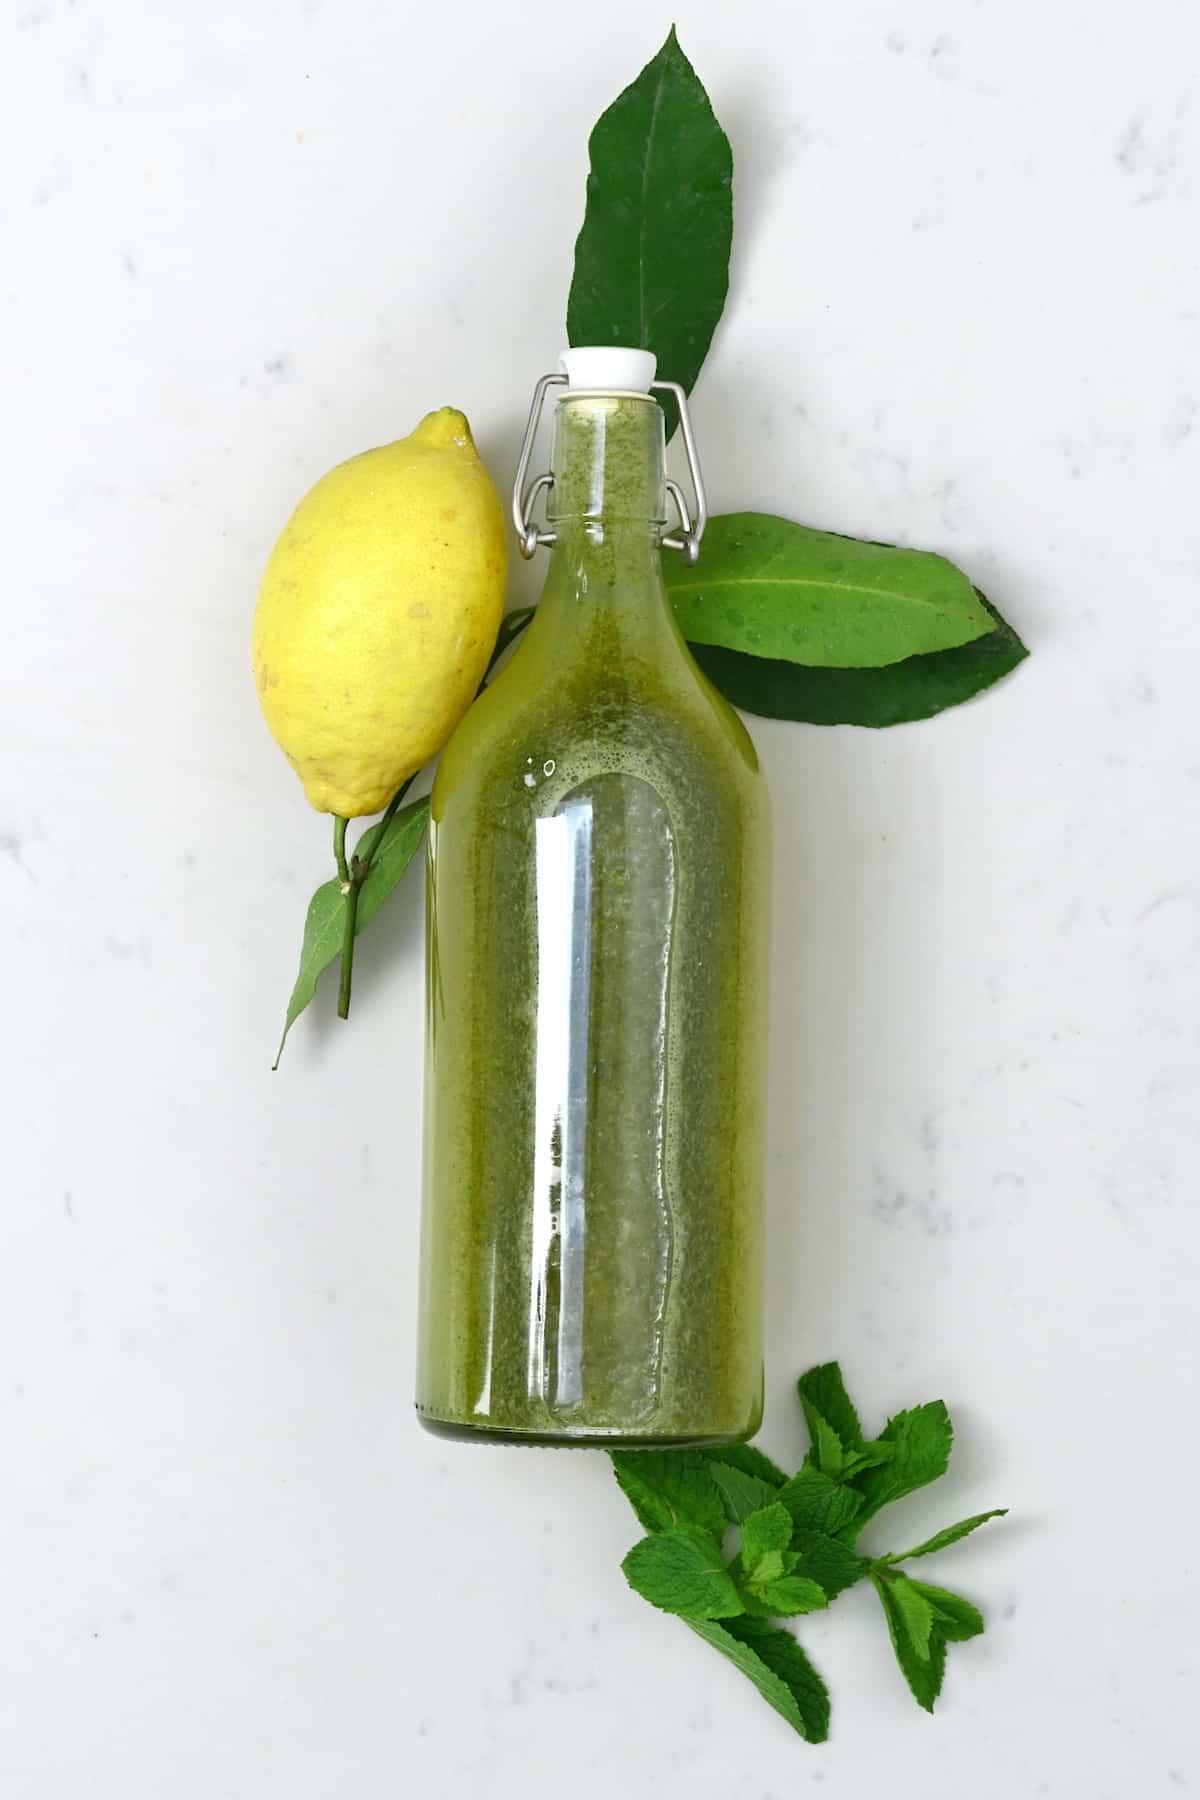 Mint lemonade in a bottle and lemon and mint leaves